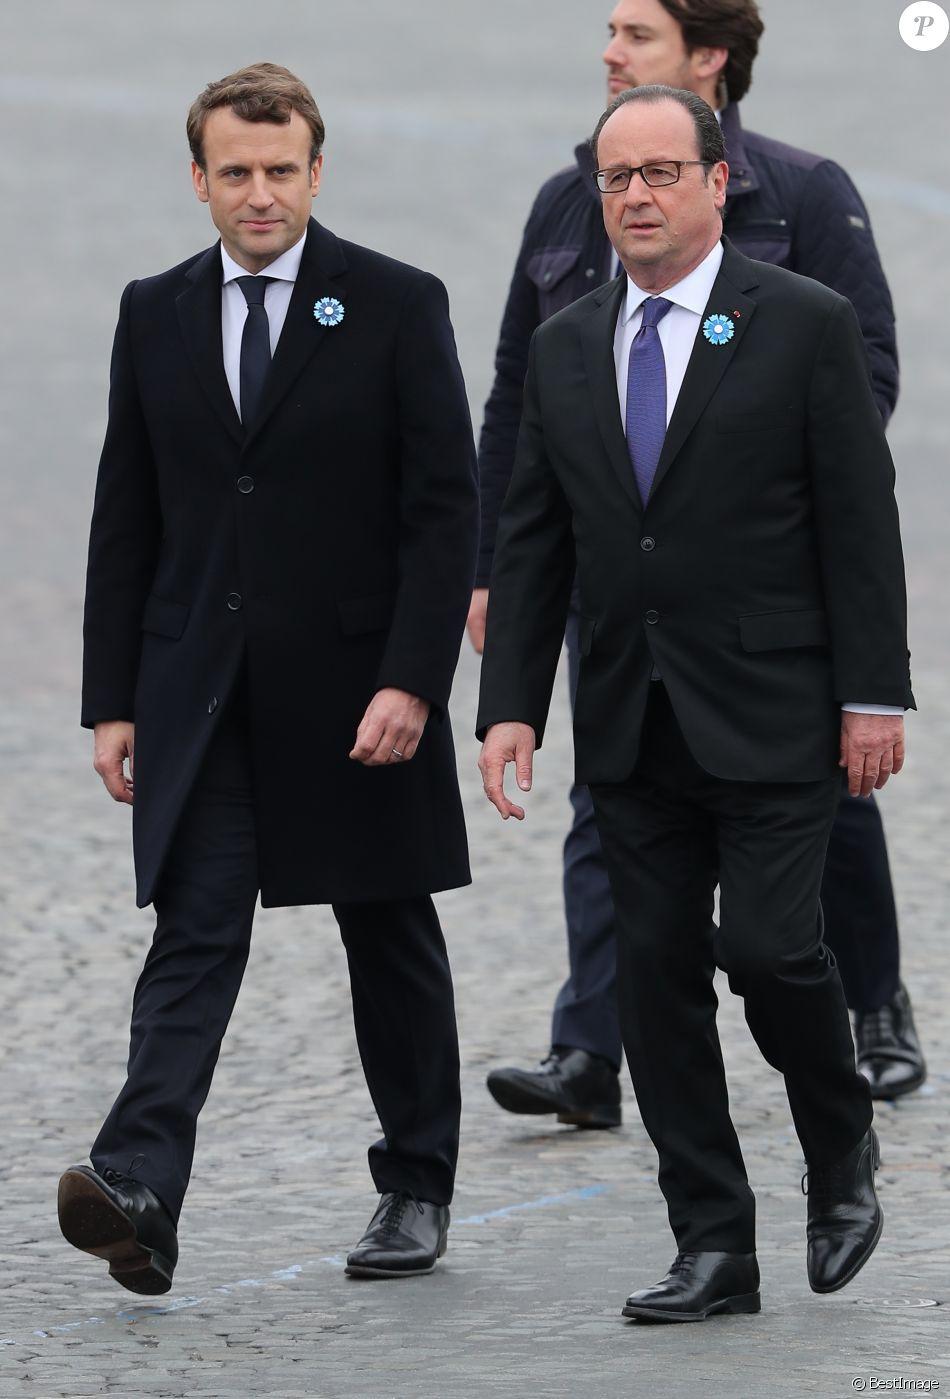 Le President Elu Emmanuel Macron Et Le President Francois Hollande